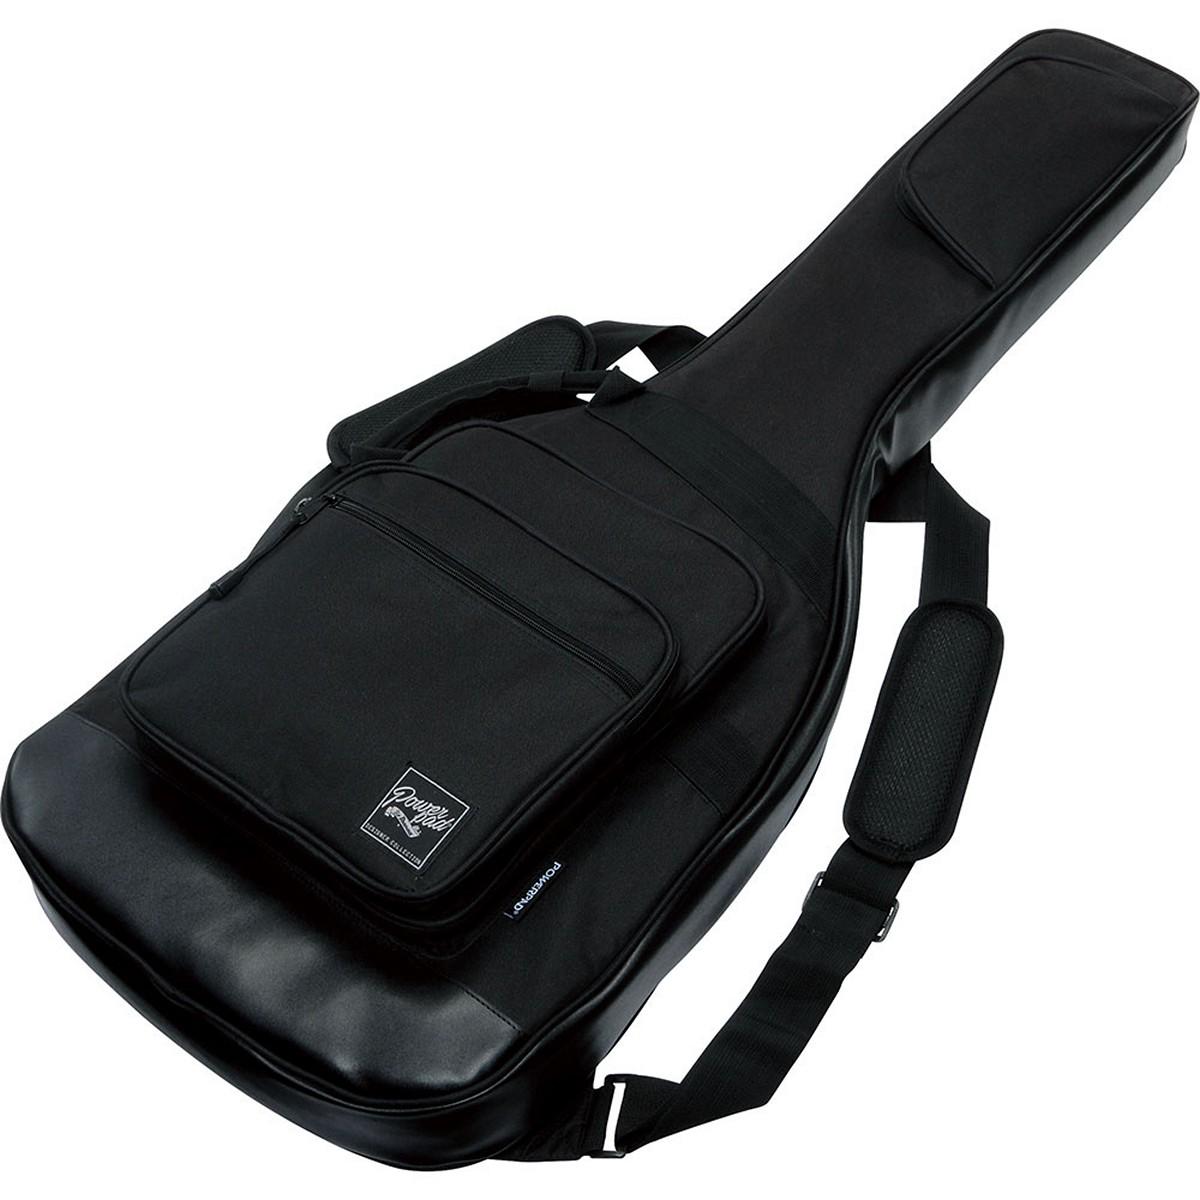 IBANEZ IGB540-BK BLACK - BORSA PER CHITARRA ELETTRICA